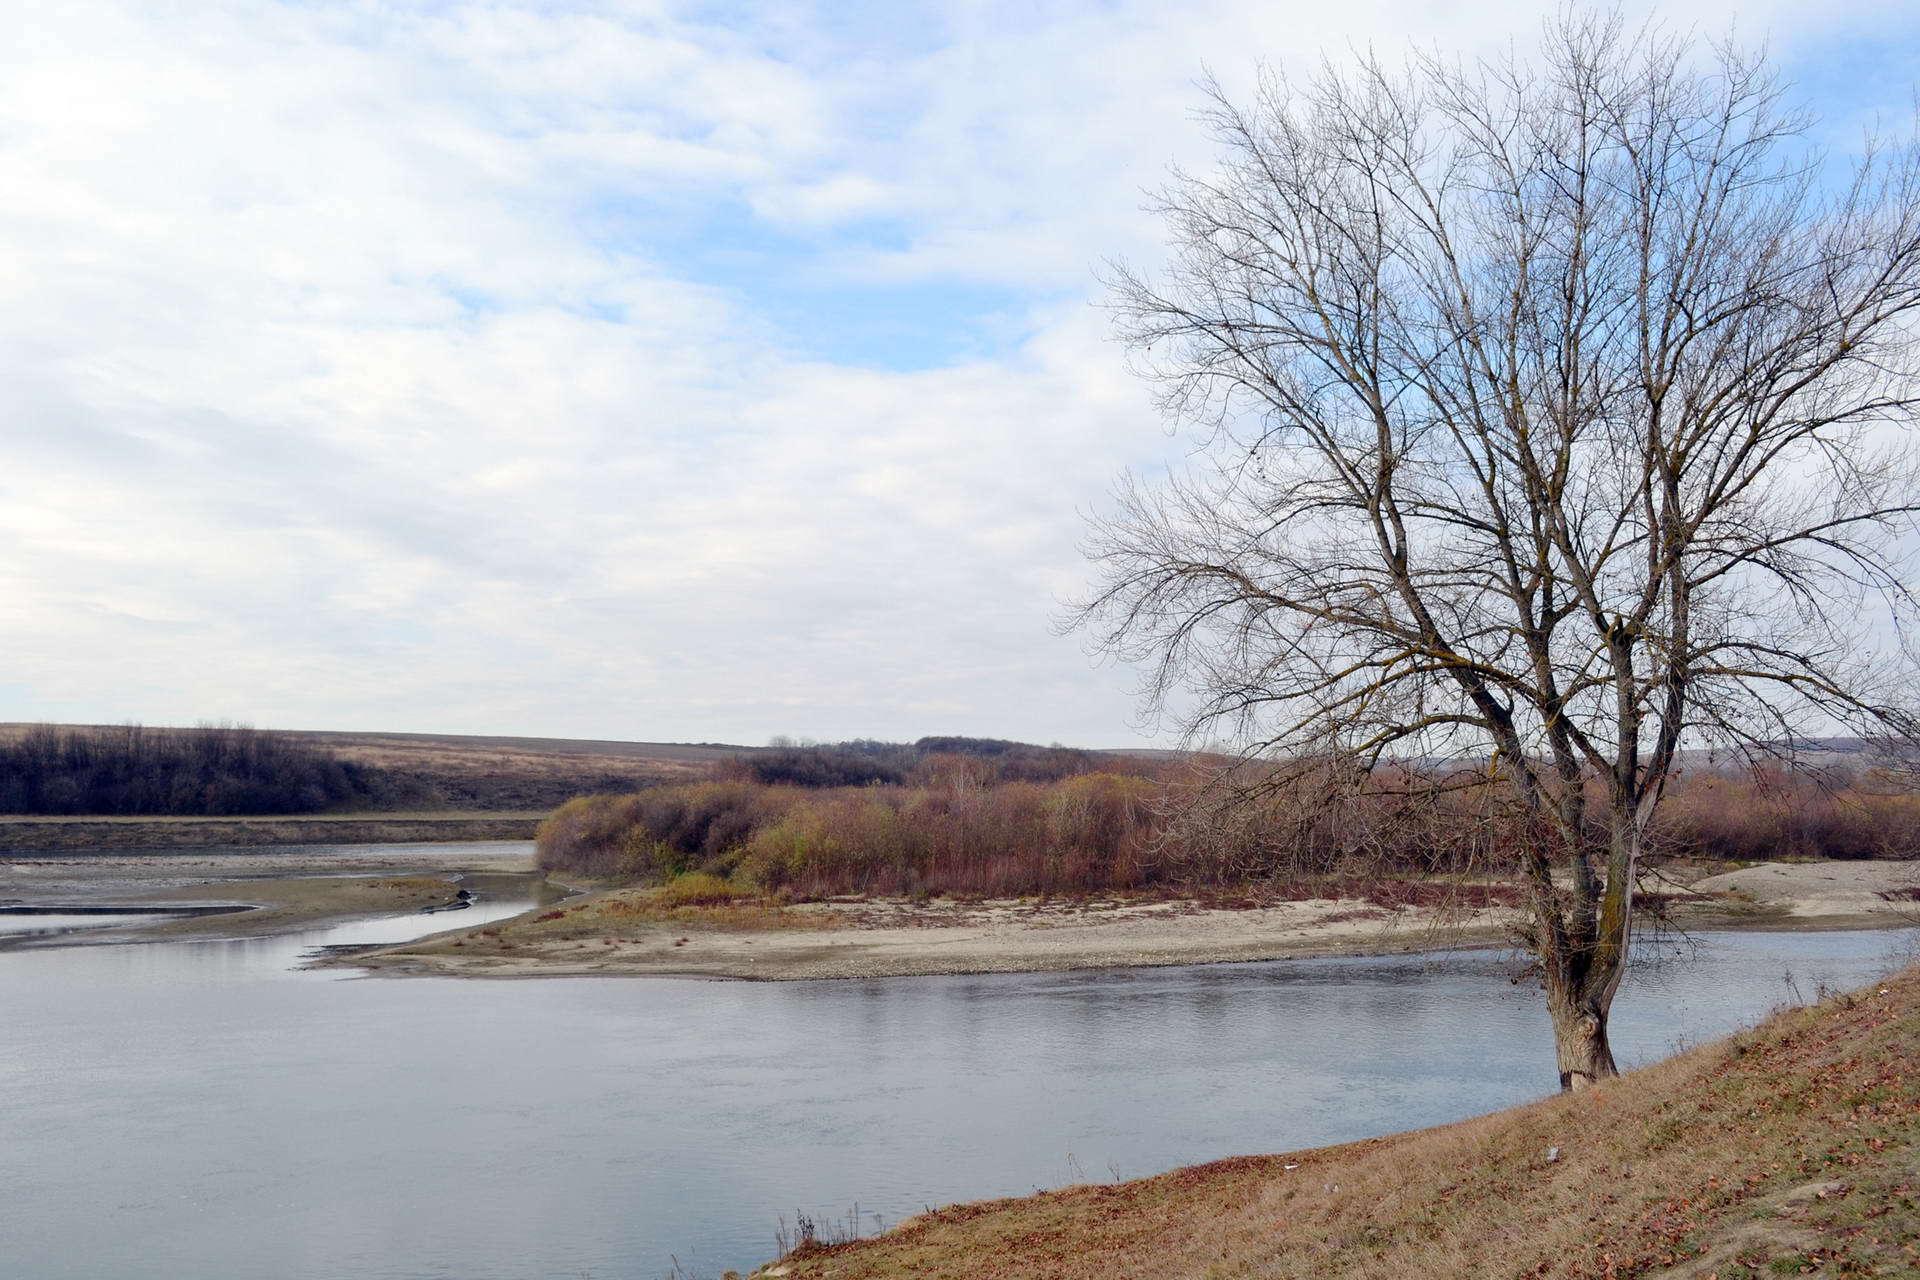 с. Дубовцы, панорама реки Днестр